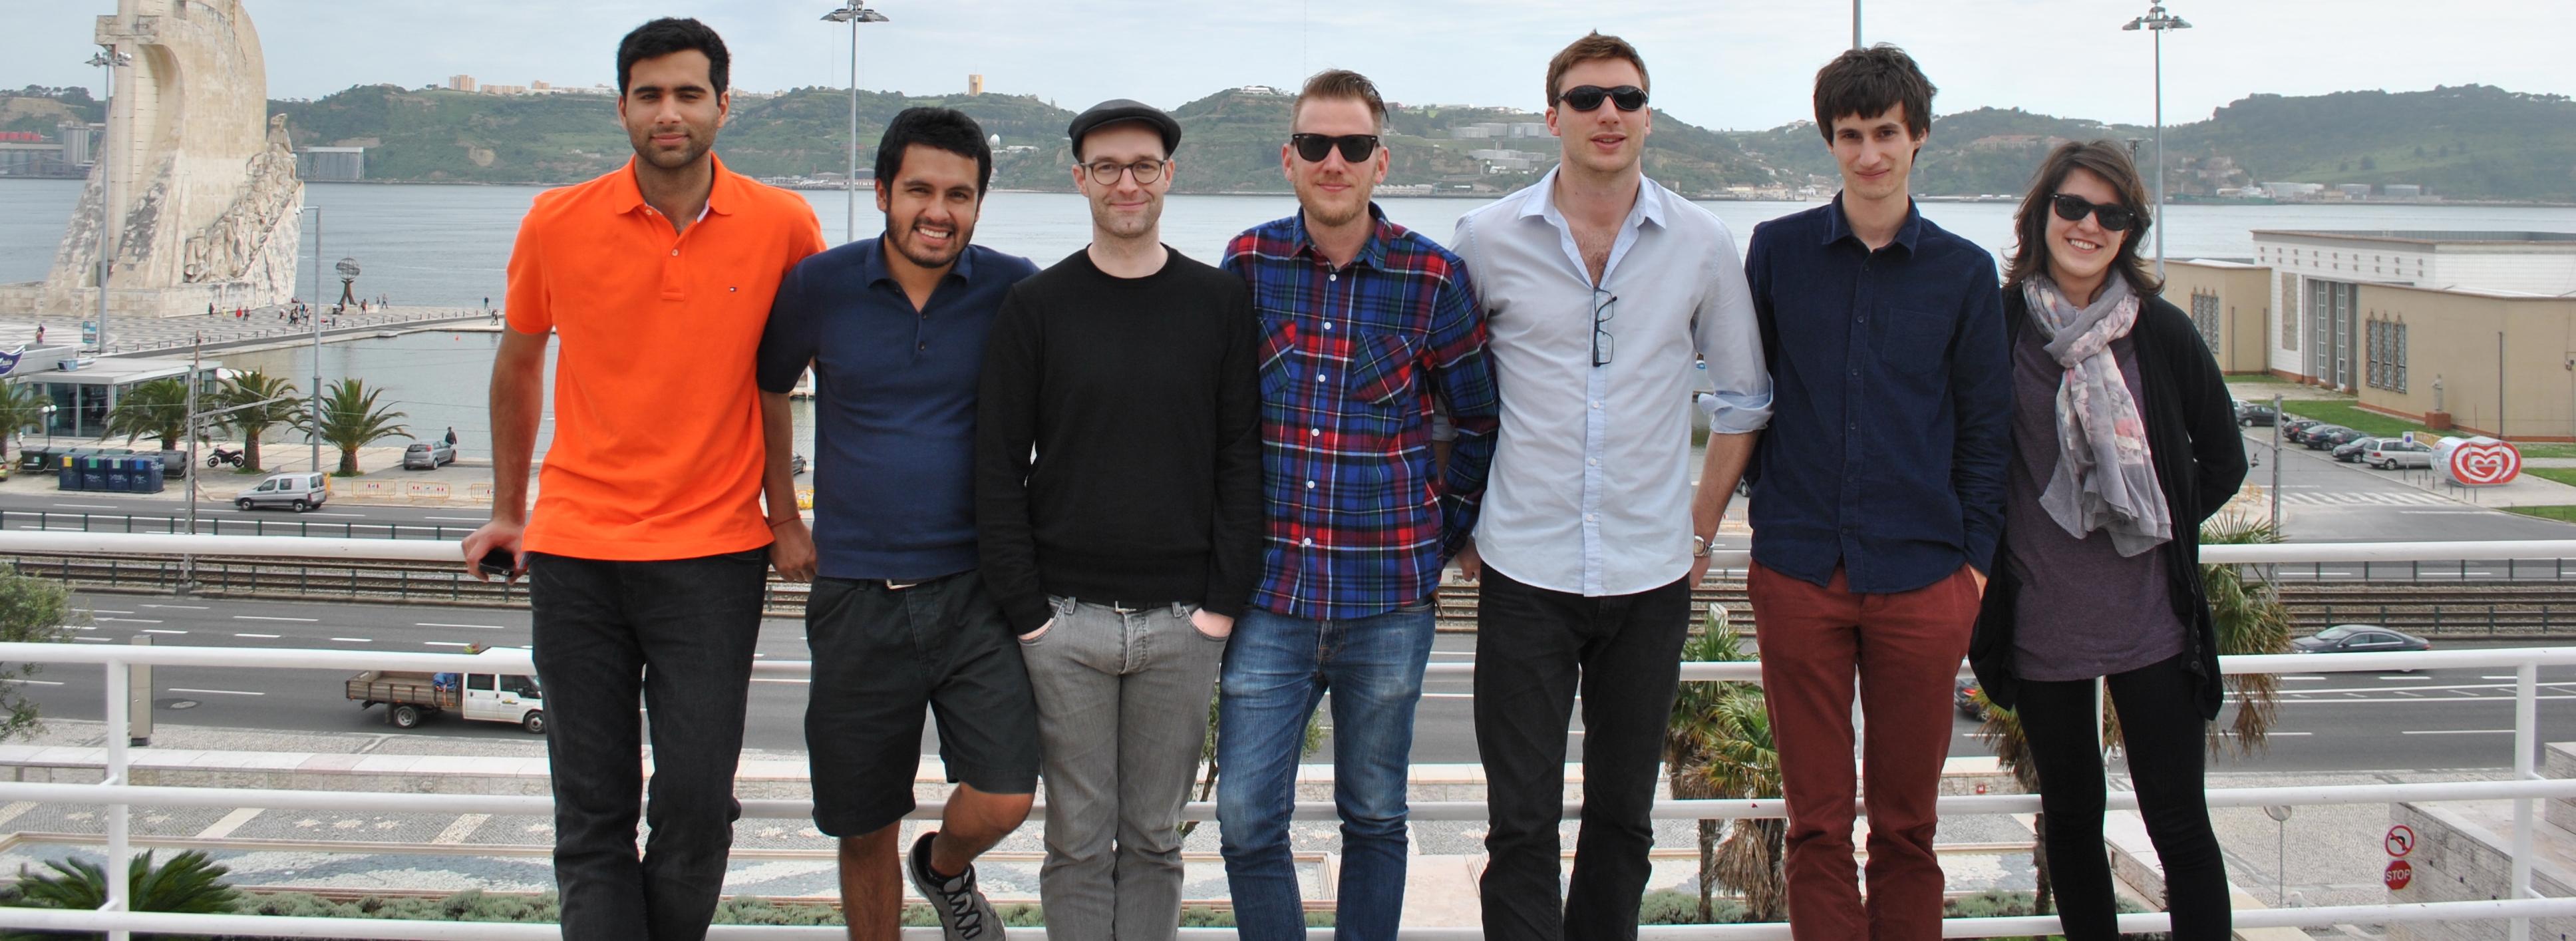 Photo of the Userlike team